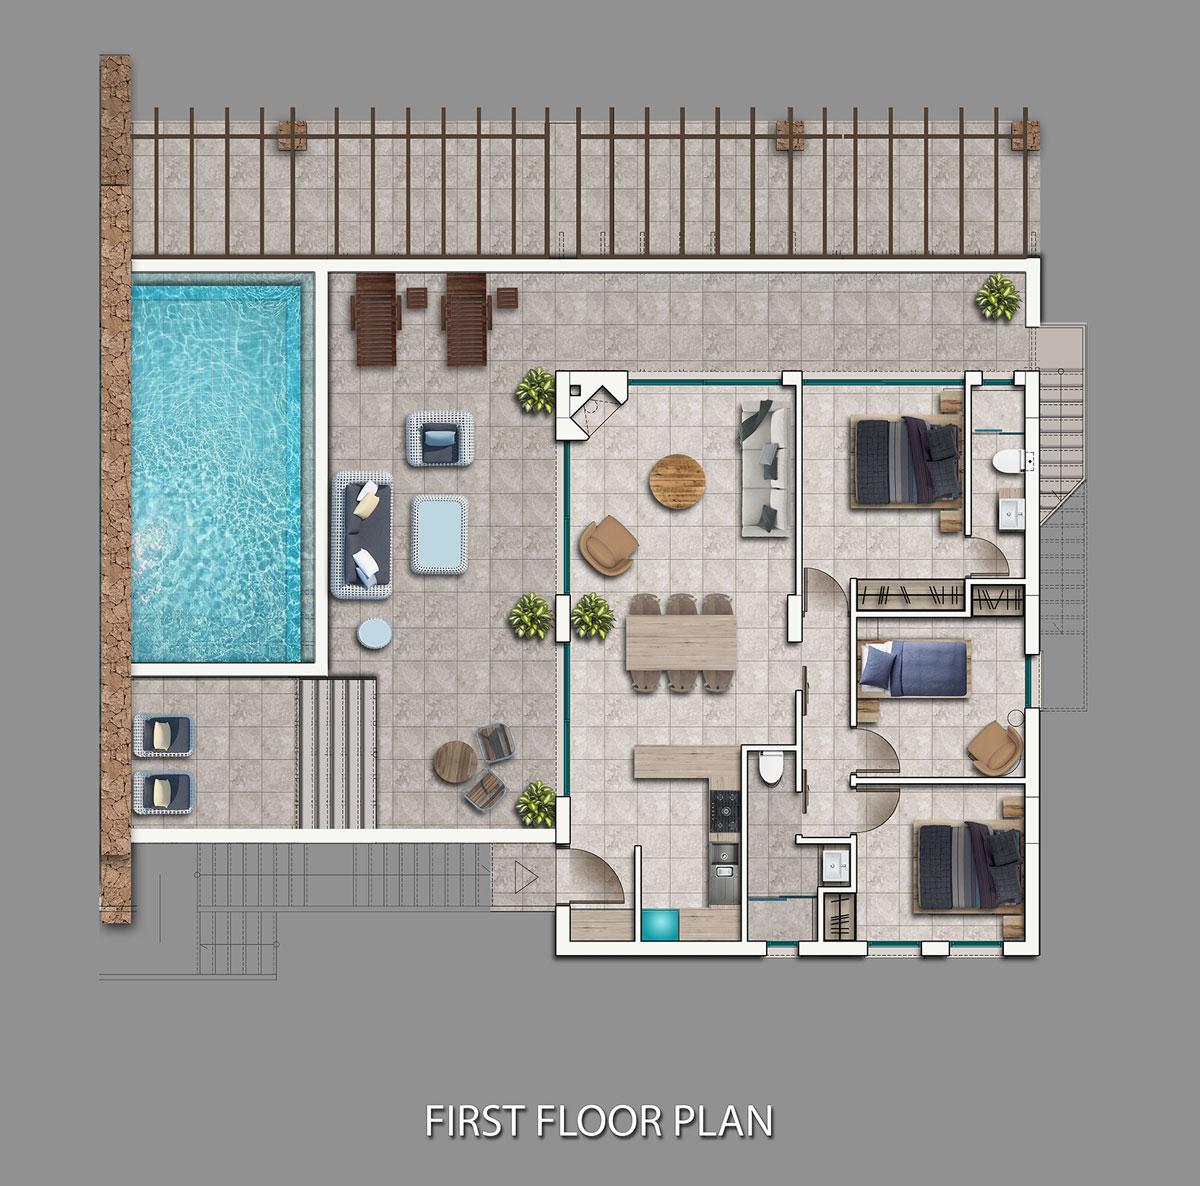 Block C1-C4 - 3 bedroom penthouse